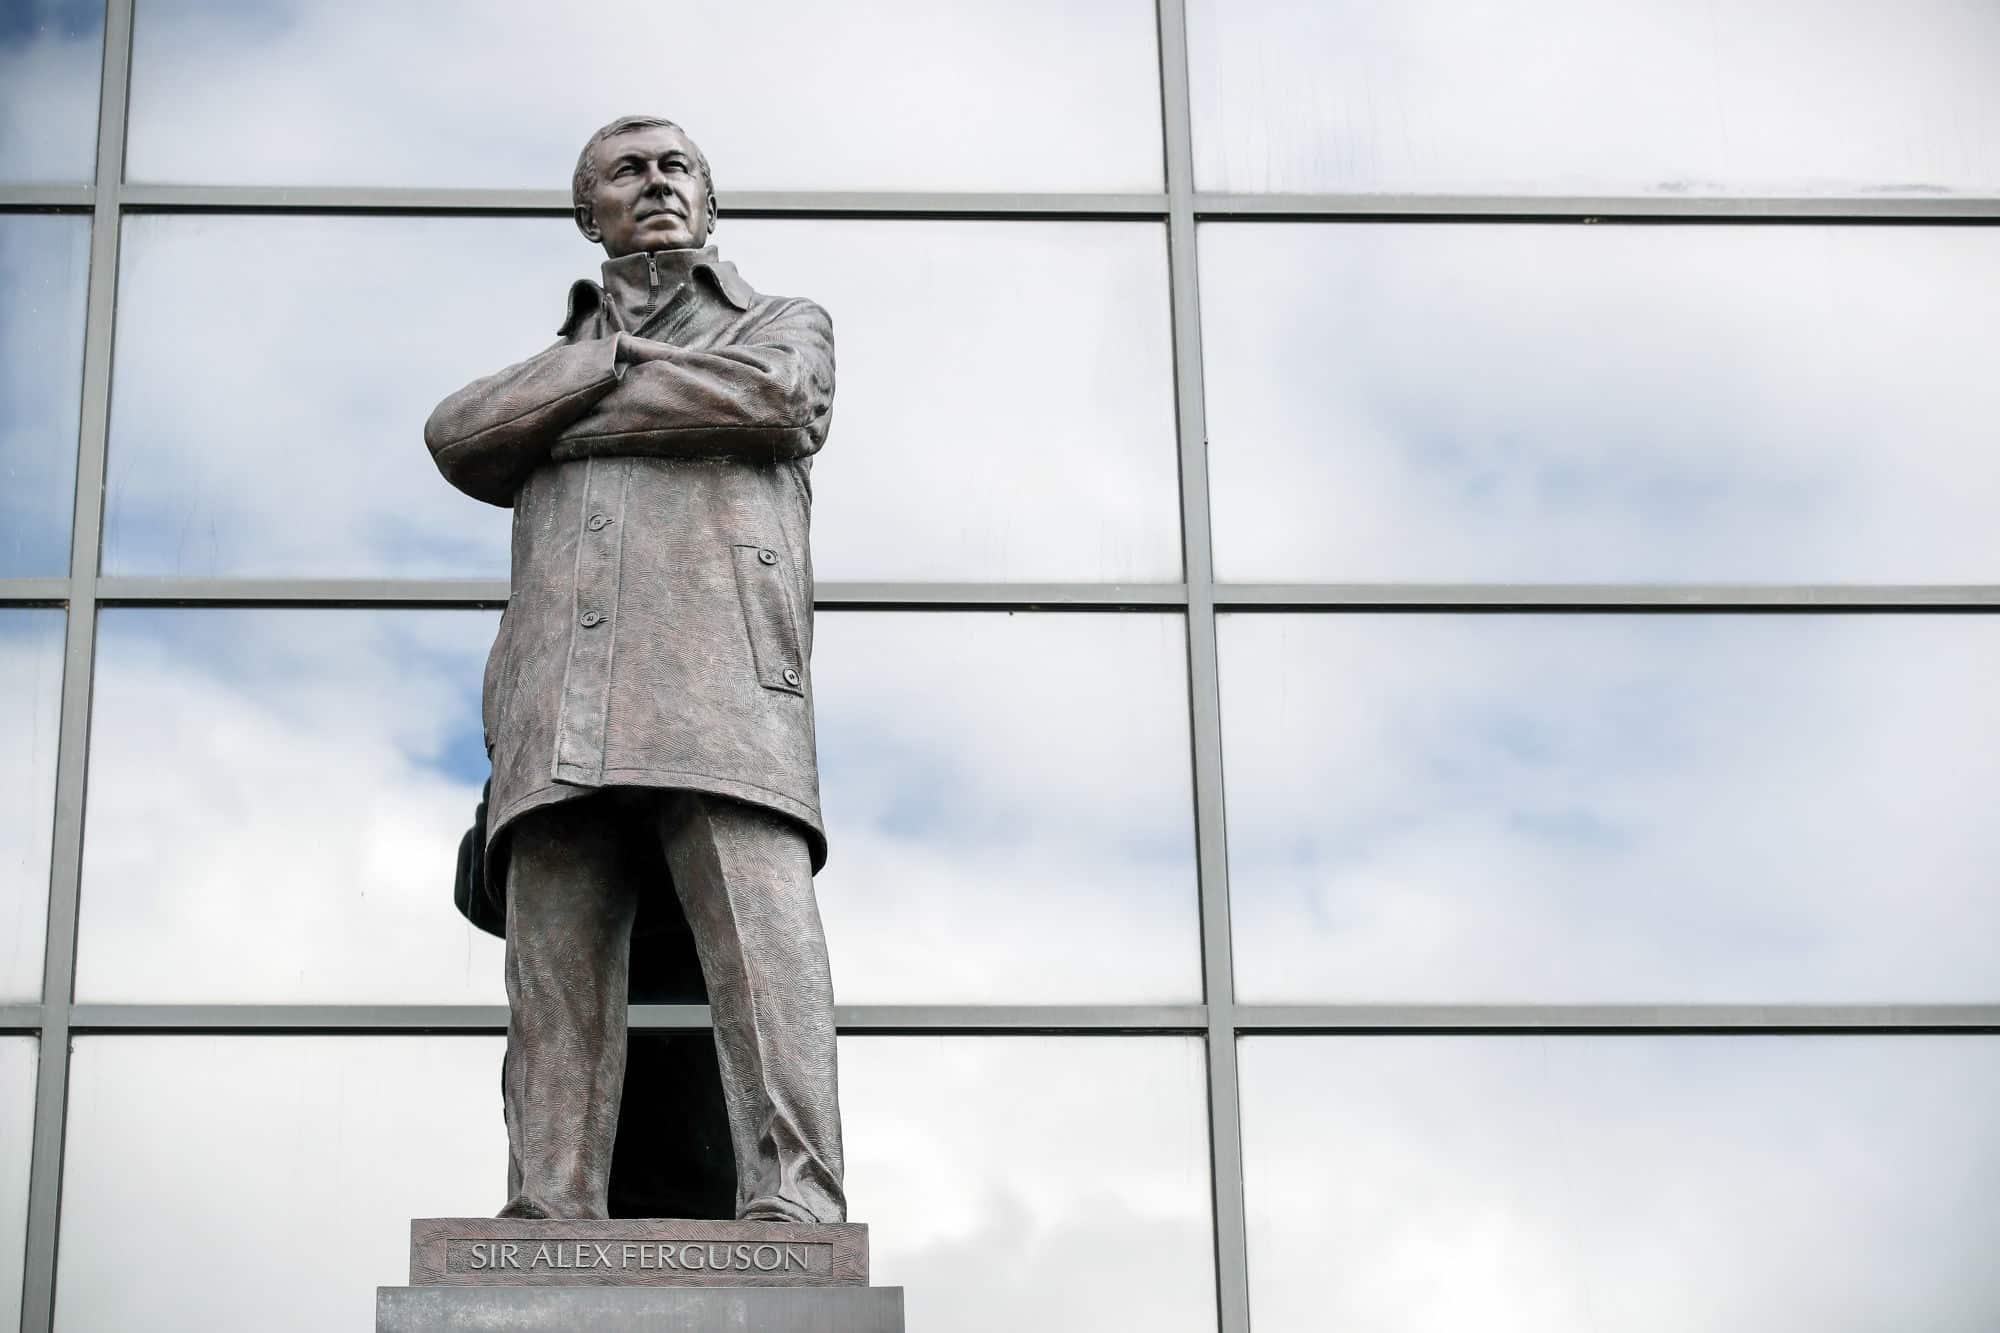 Alex Ferguson (Manchester)